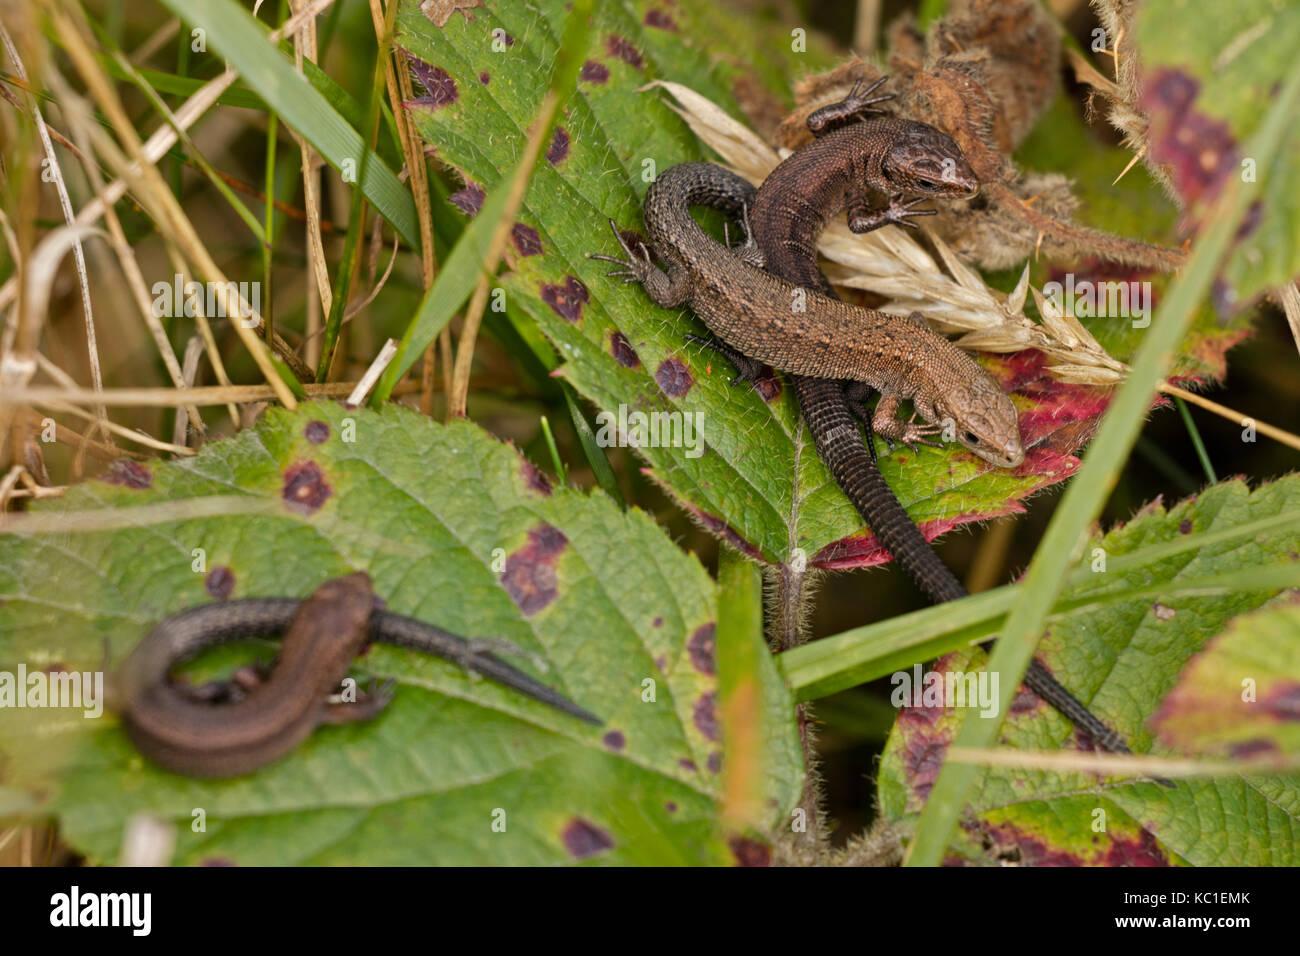 Common lizard (Lacerta vivipara), young basking, Herefordshire, England, UK - Stock Image